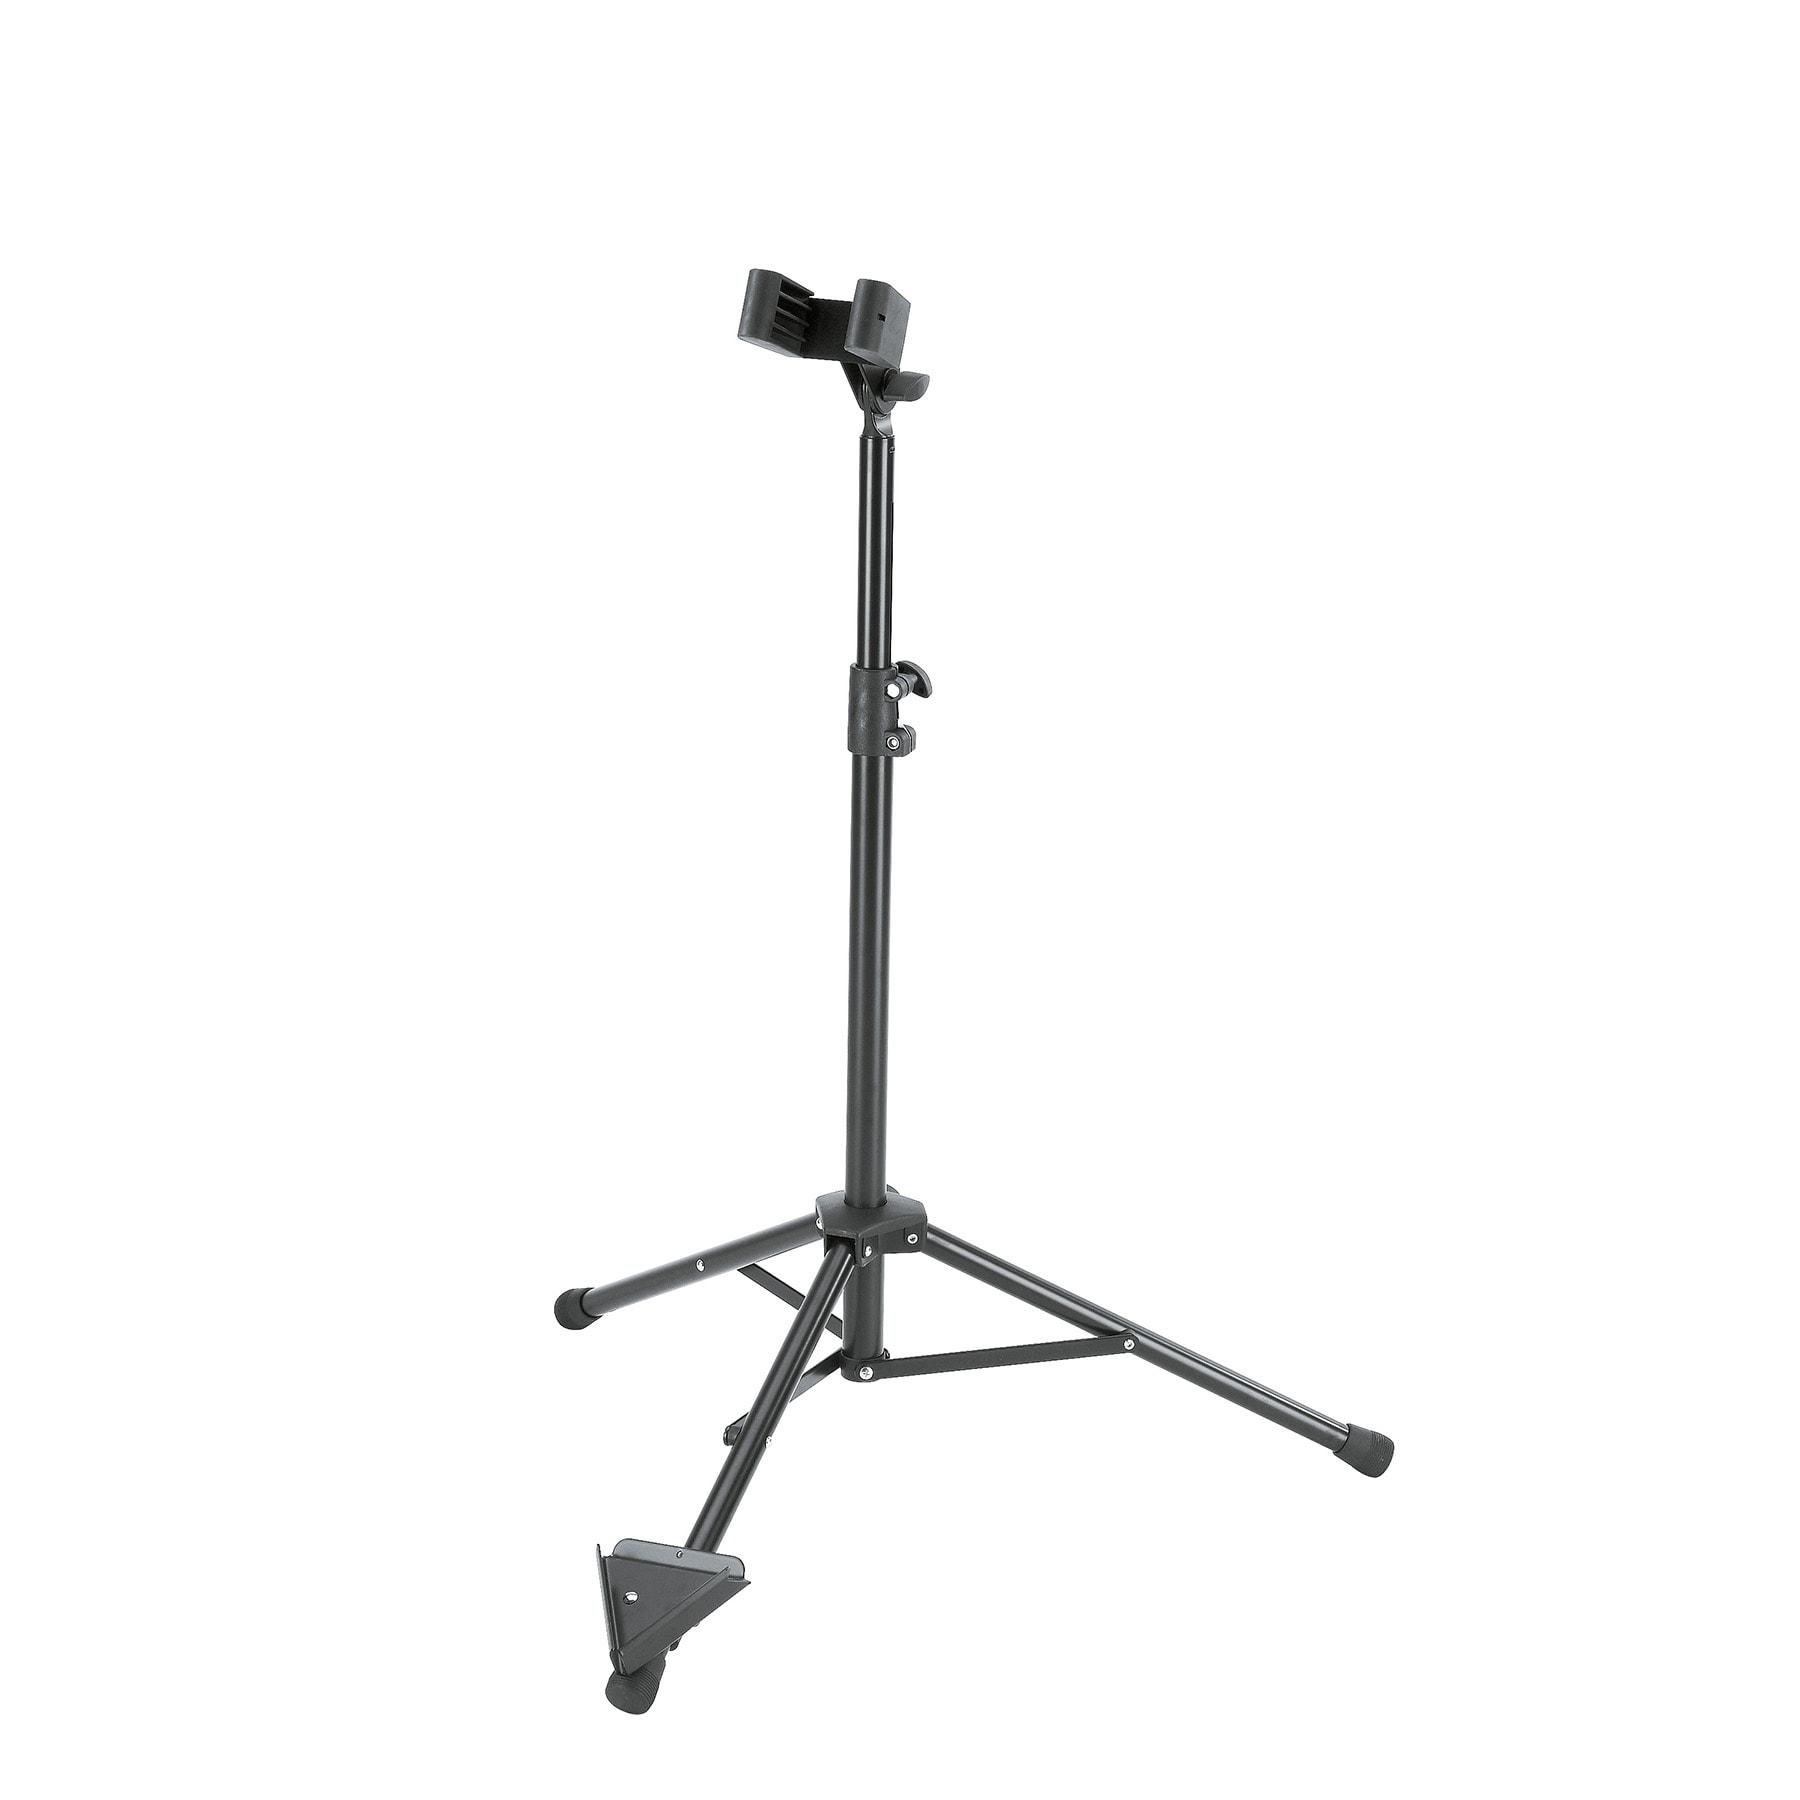 KM15060 - Bass clarinet stand